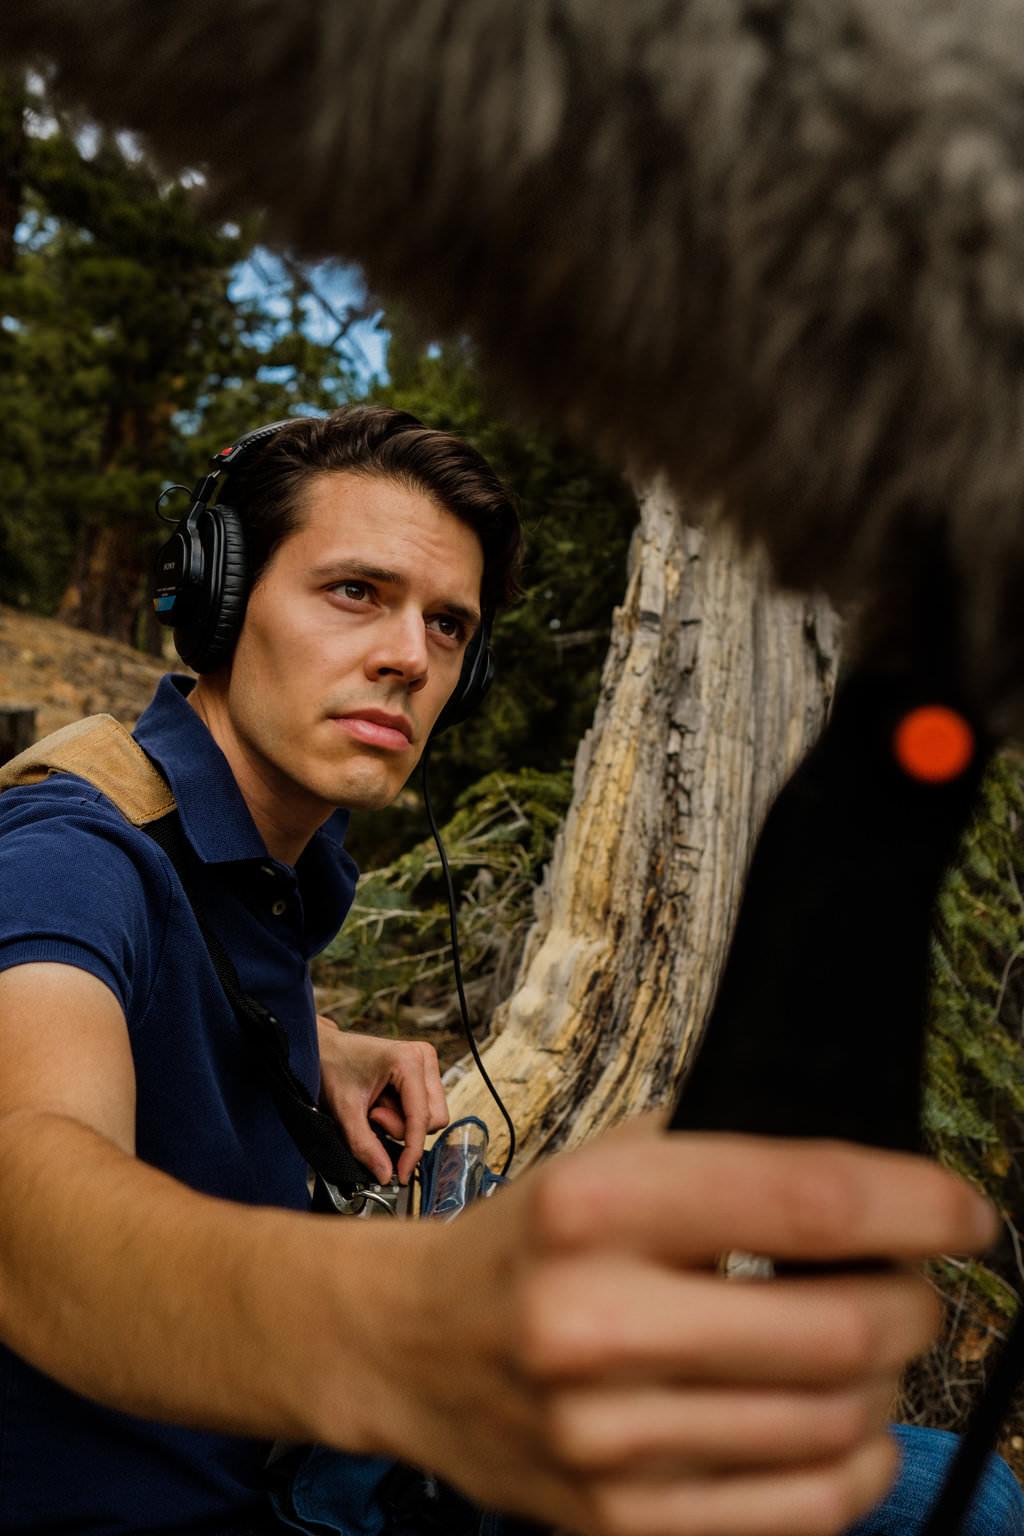 1-field-sound-recording-los-angeles-freelance-photographer-016.JPG